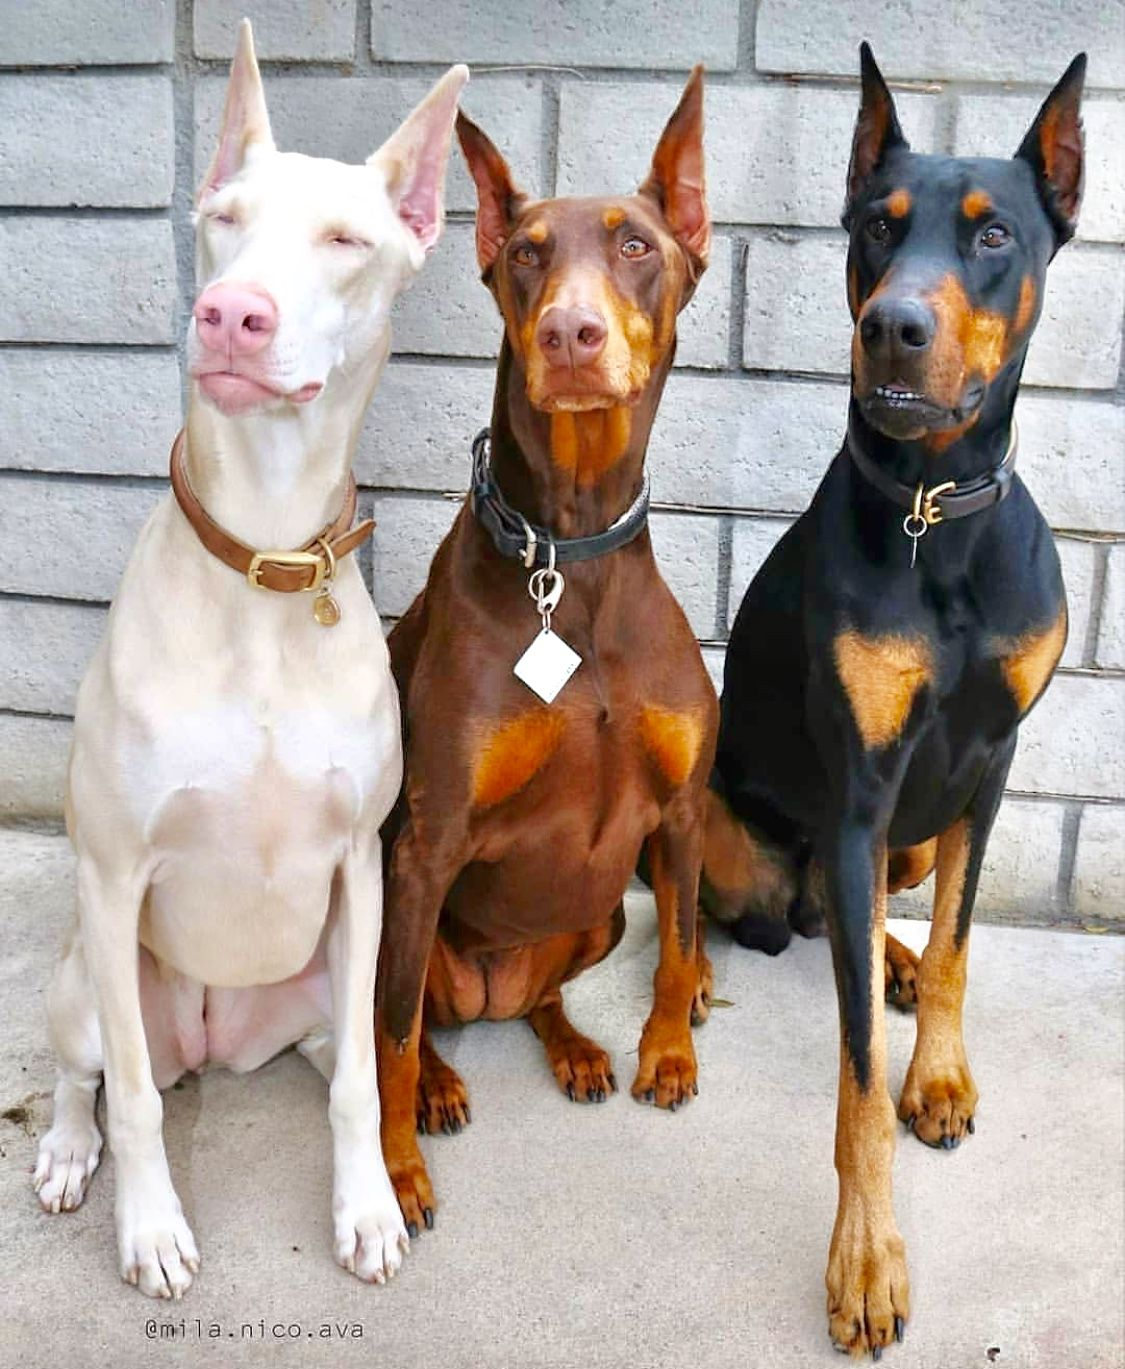 Dobermans Doberman Pinscher Dog Dog Breeds Doberman Puppy